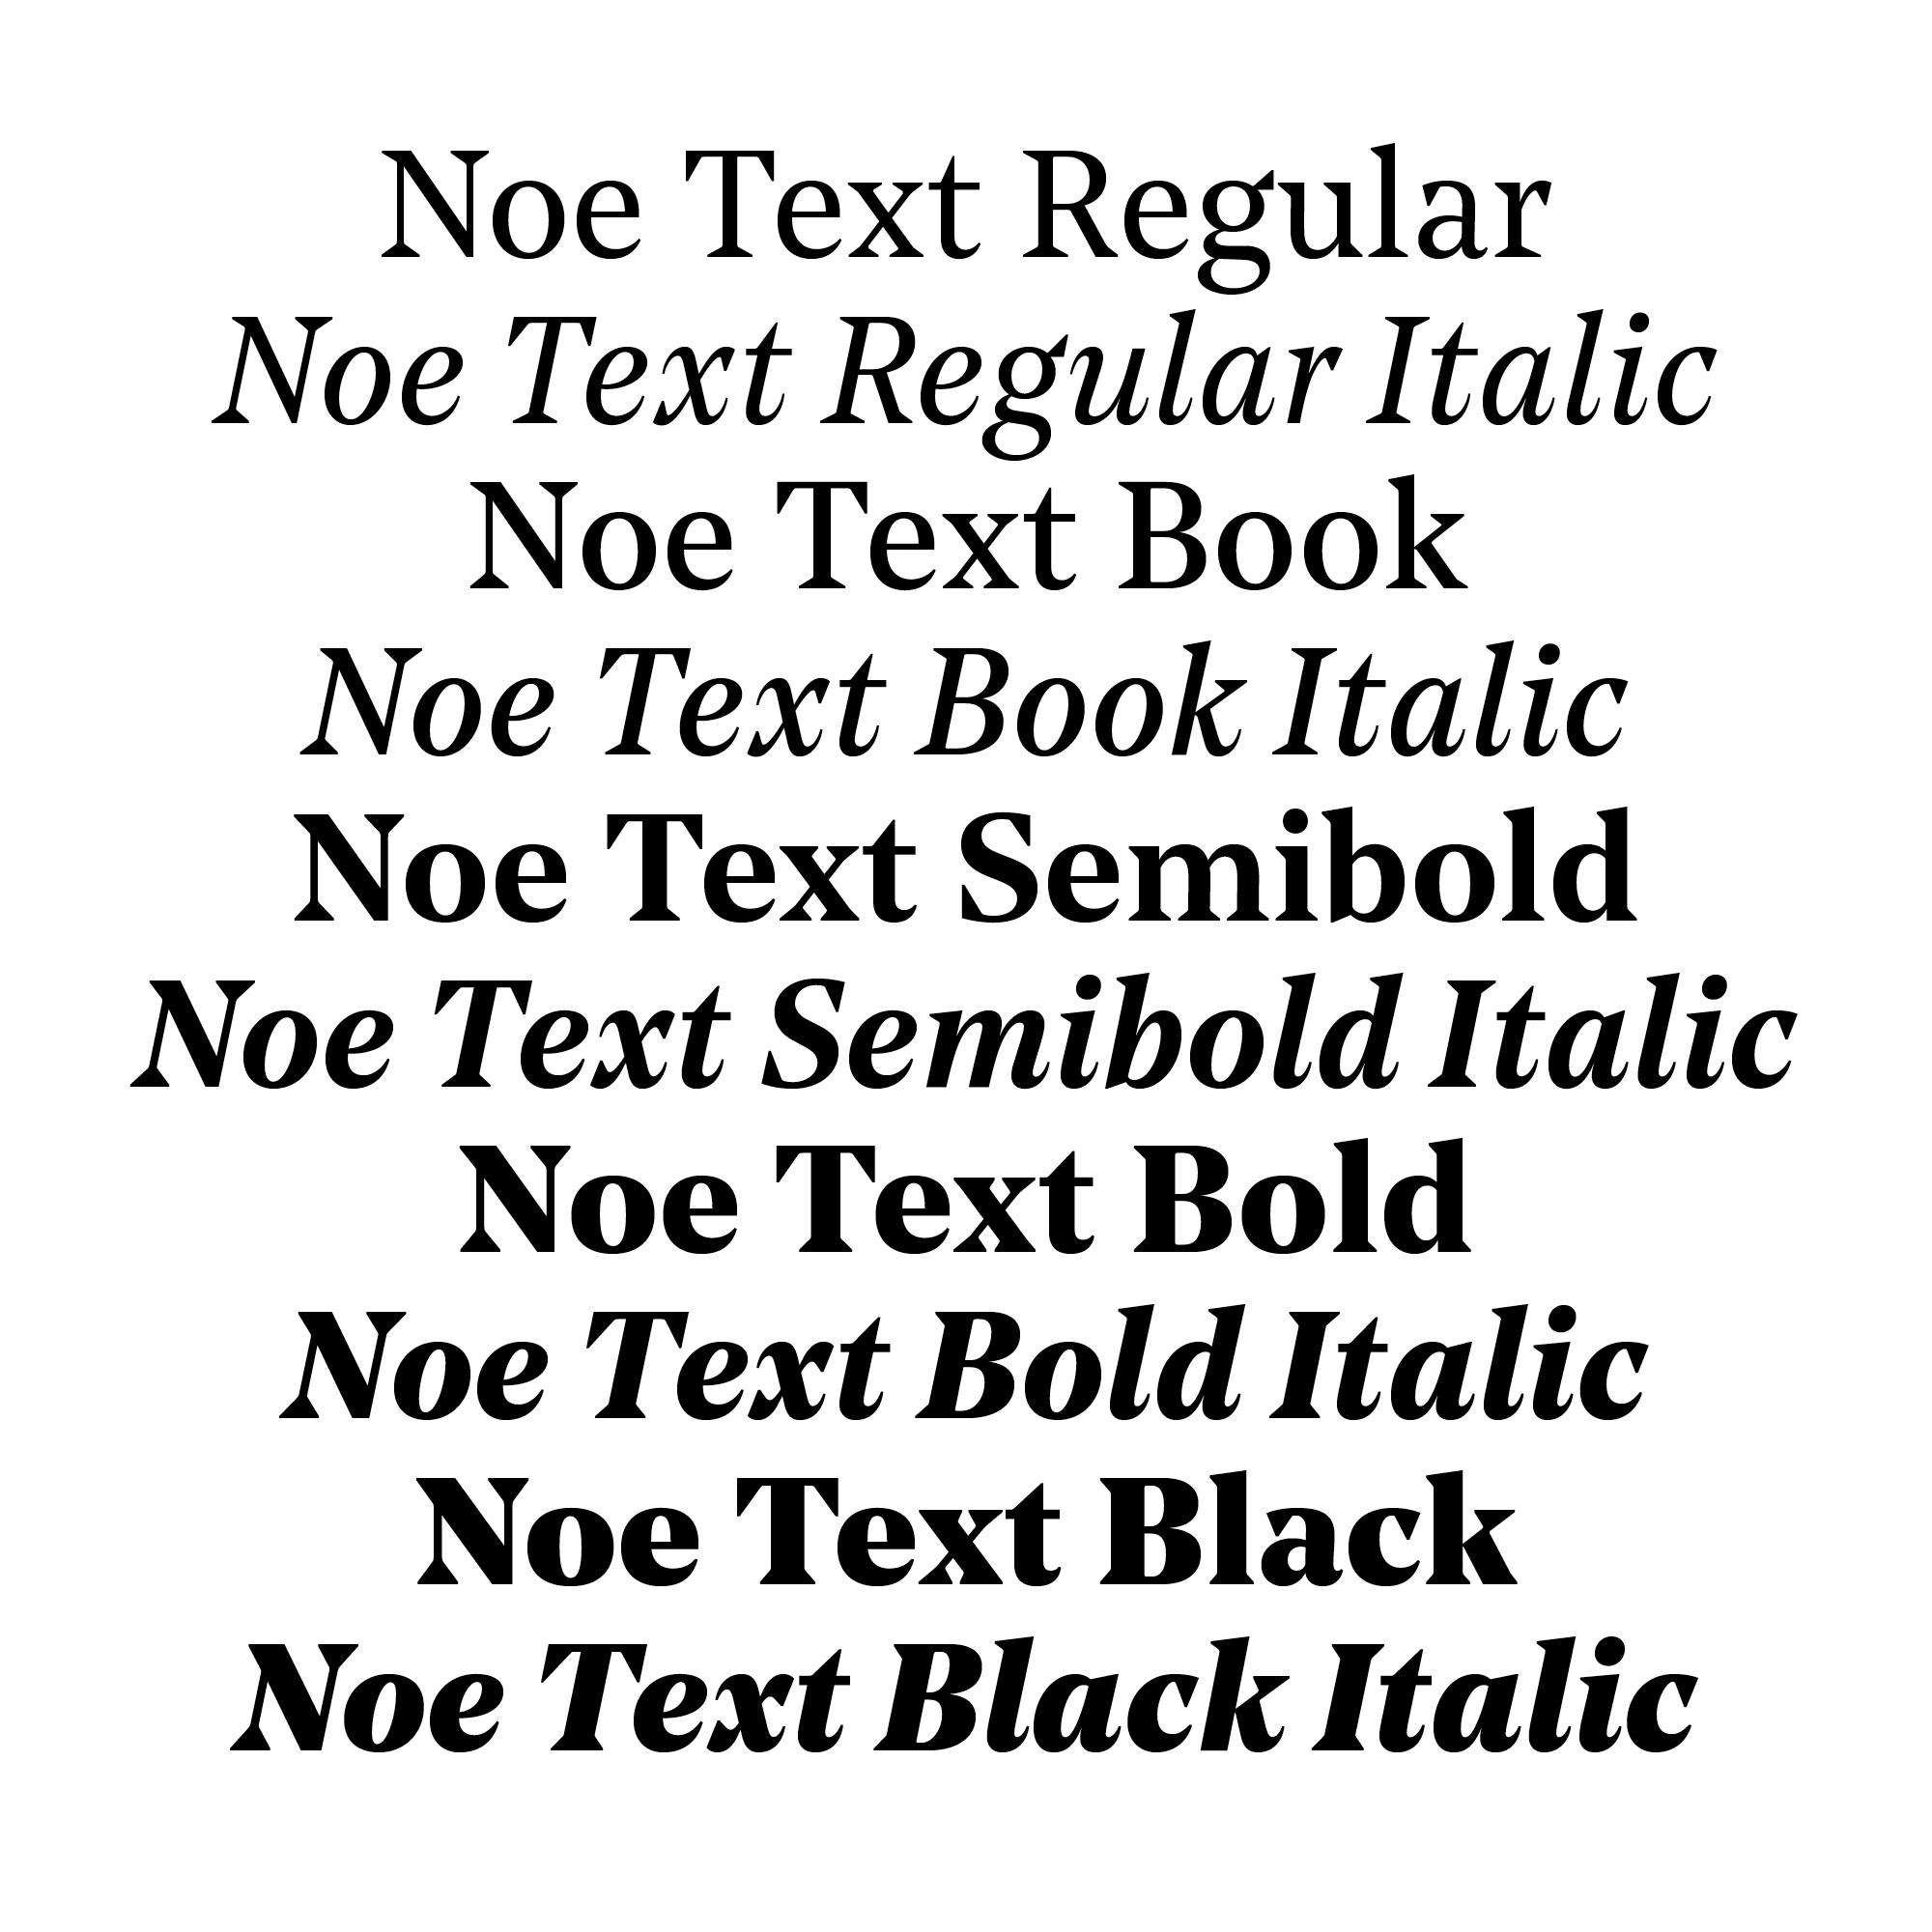 noe_text_1-3